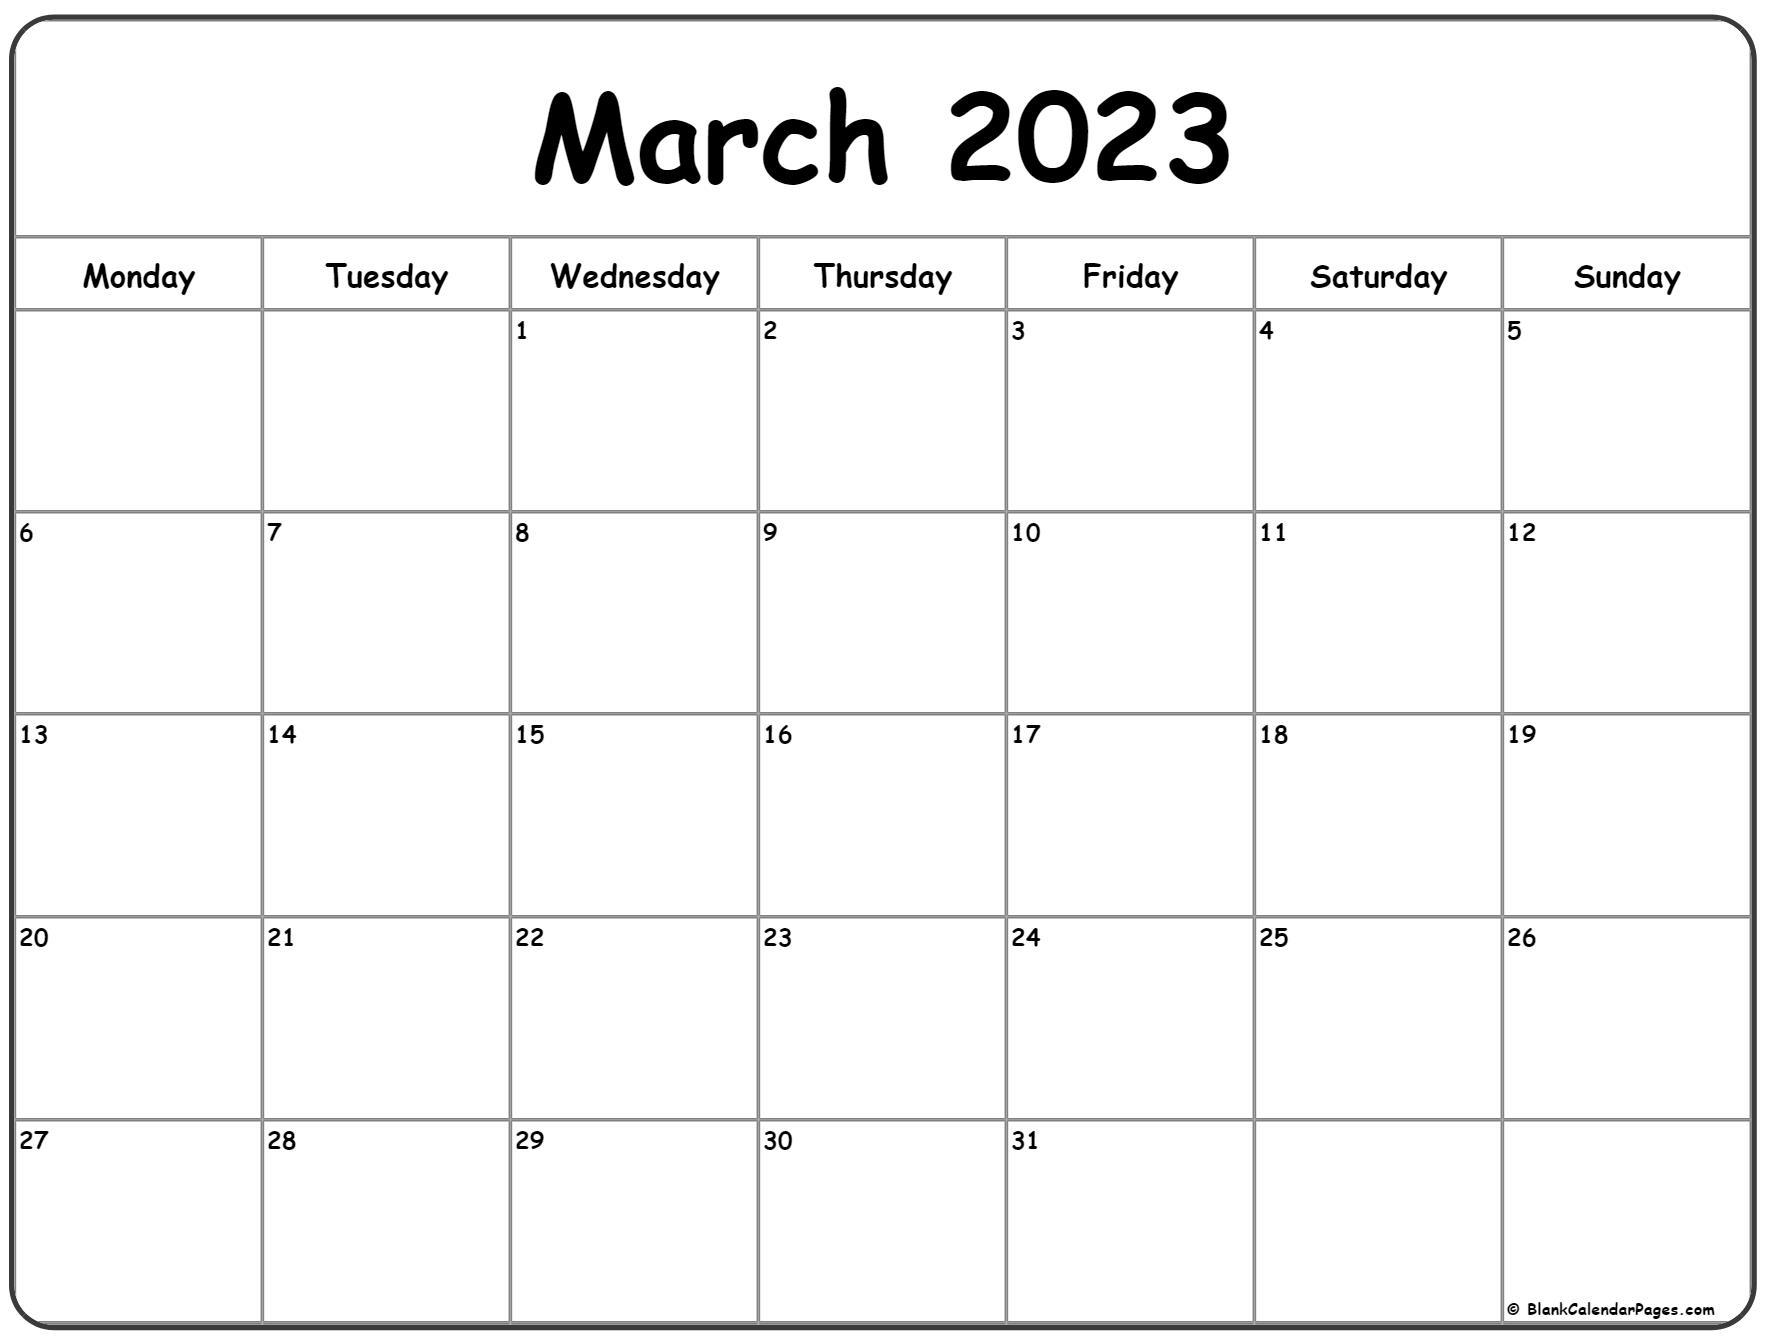 March 2023 Monday calendar. Monday to Sunday